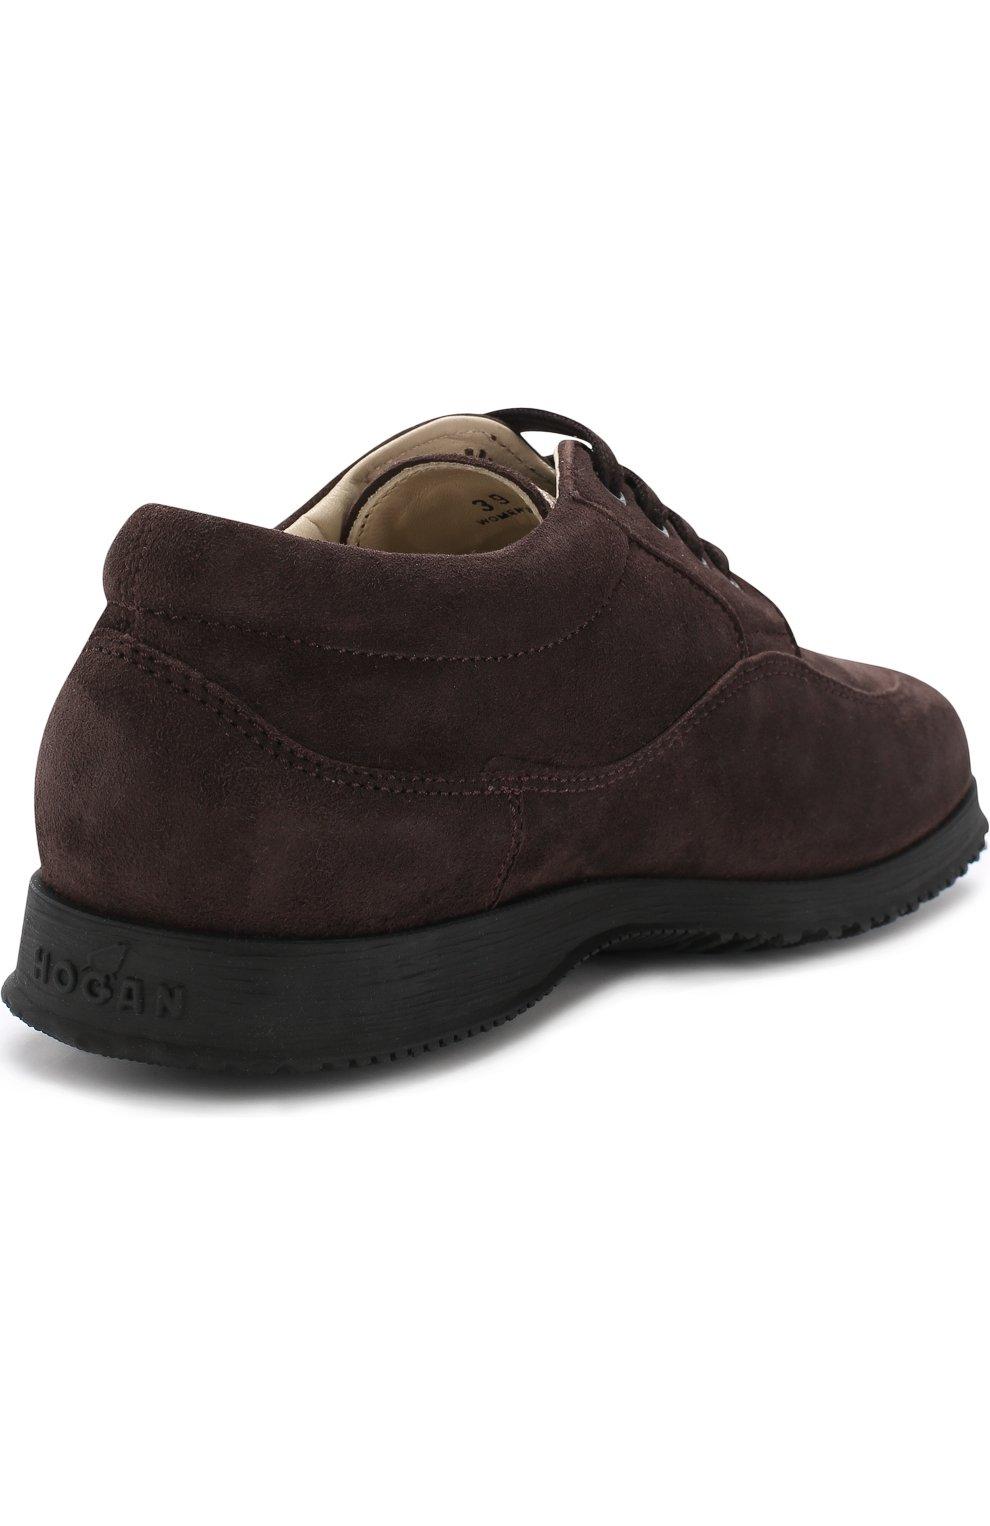 Замшевые ботинки Traditional на шнуровке | Фото №4